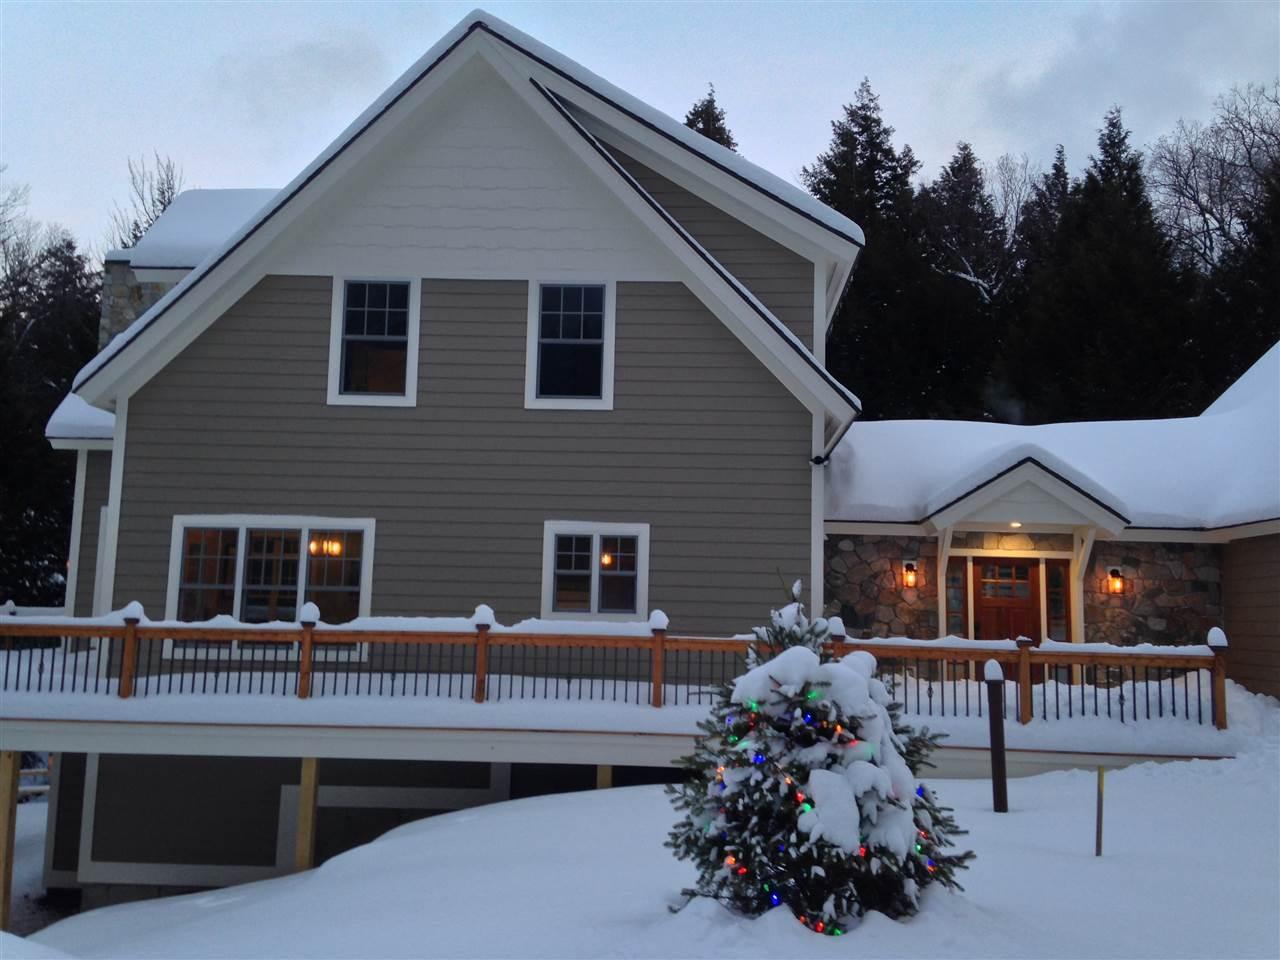 Mount-Snow-Real-Estate-4465115-7